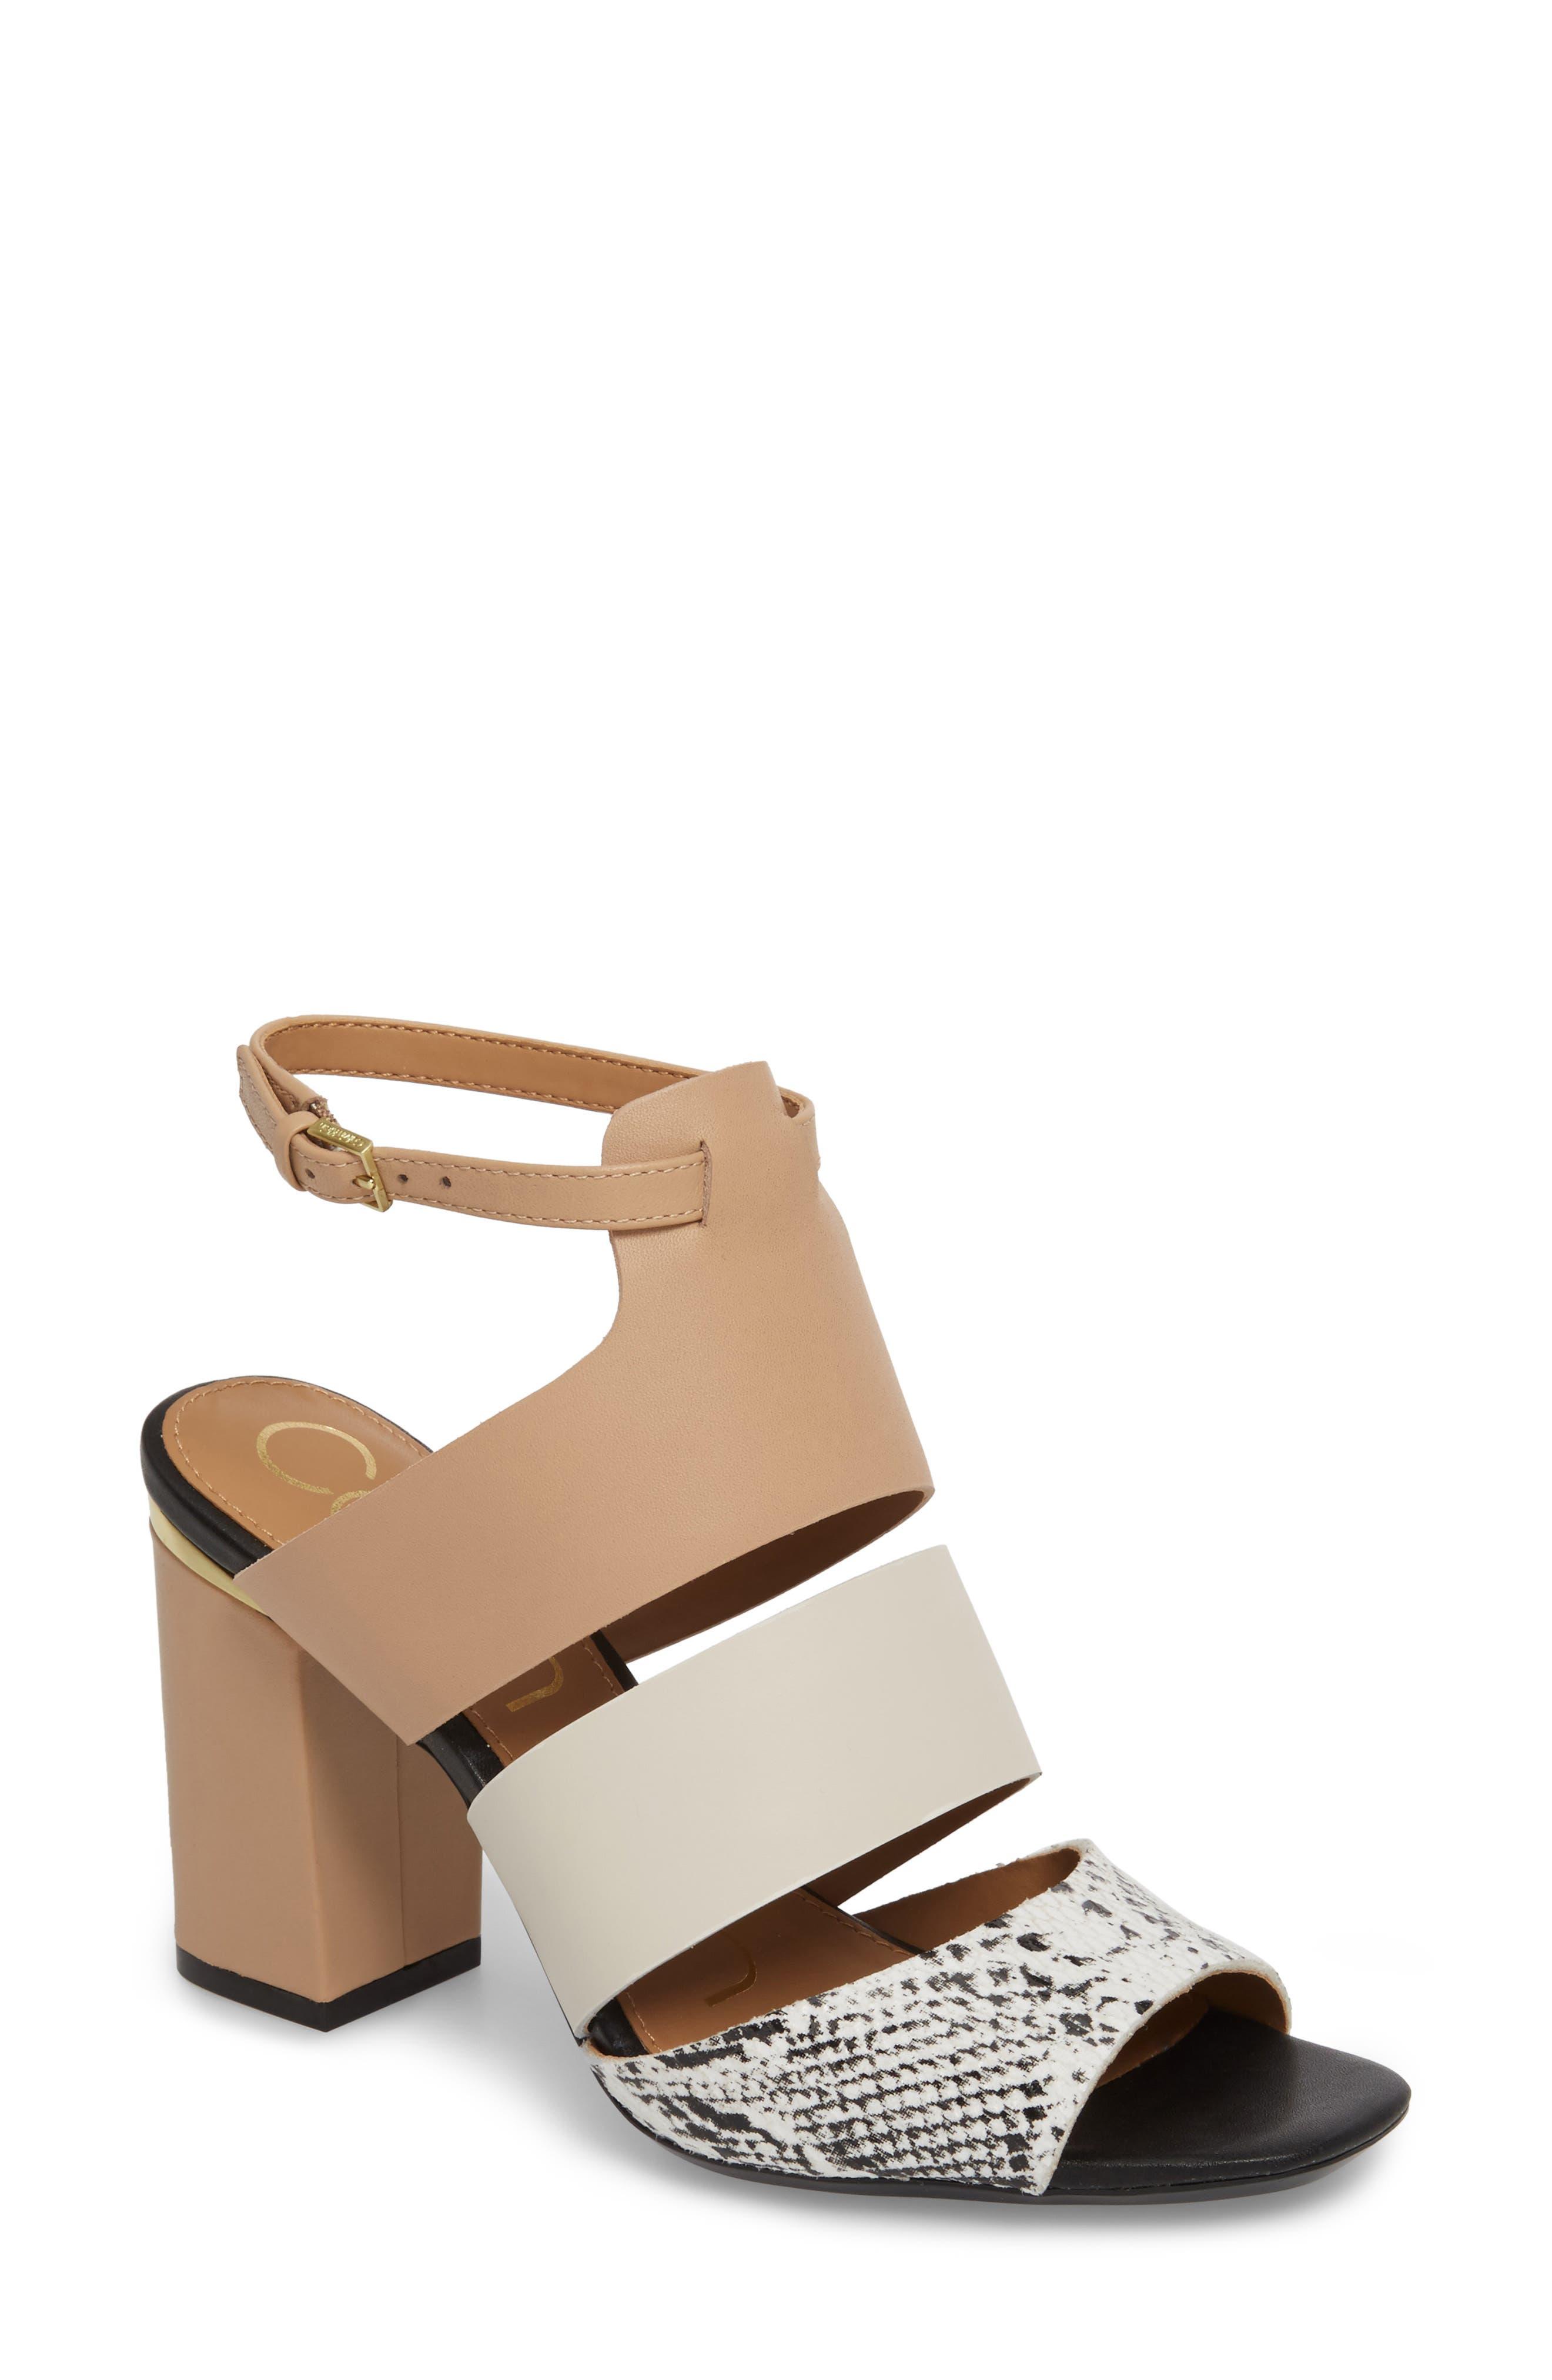 CALVIN KLEIN, Caran Block Heel Sandal, Main thumbnail 1, color, BLACK/ WHITE LEATHER